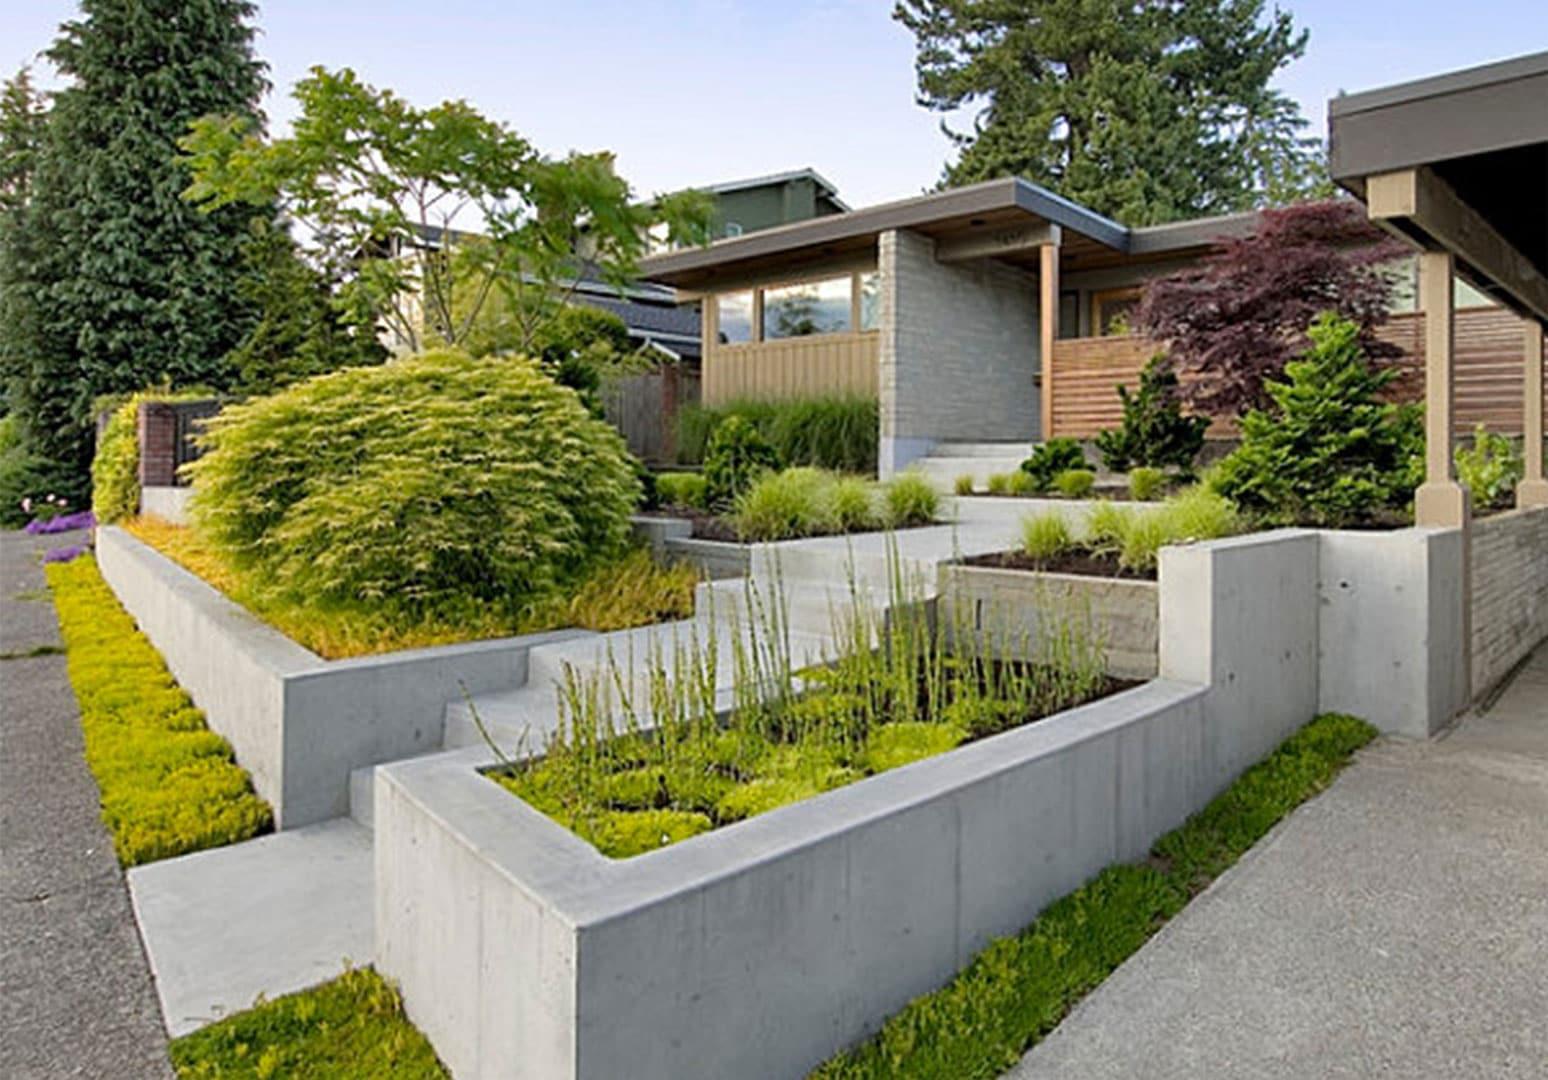 Best Front Yard Landscaping Idea